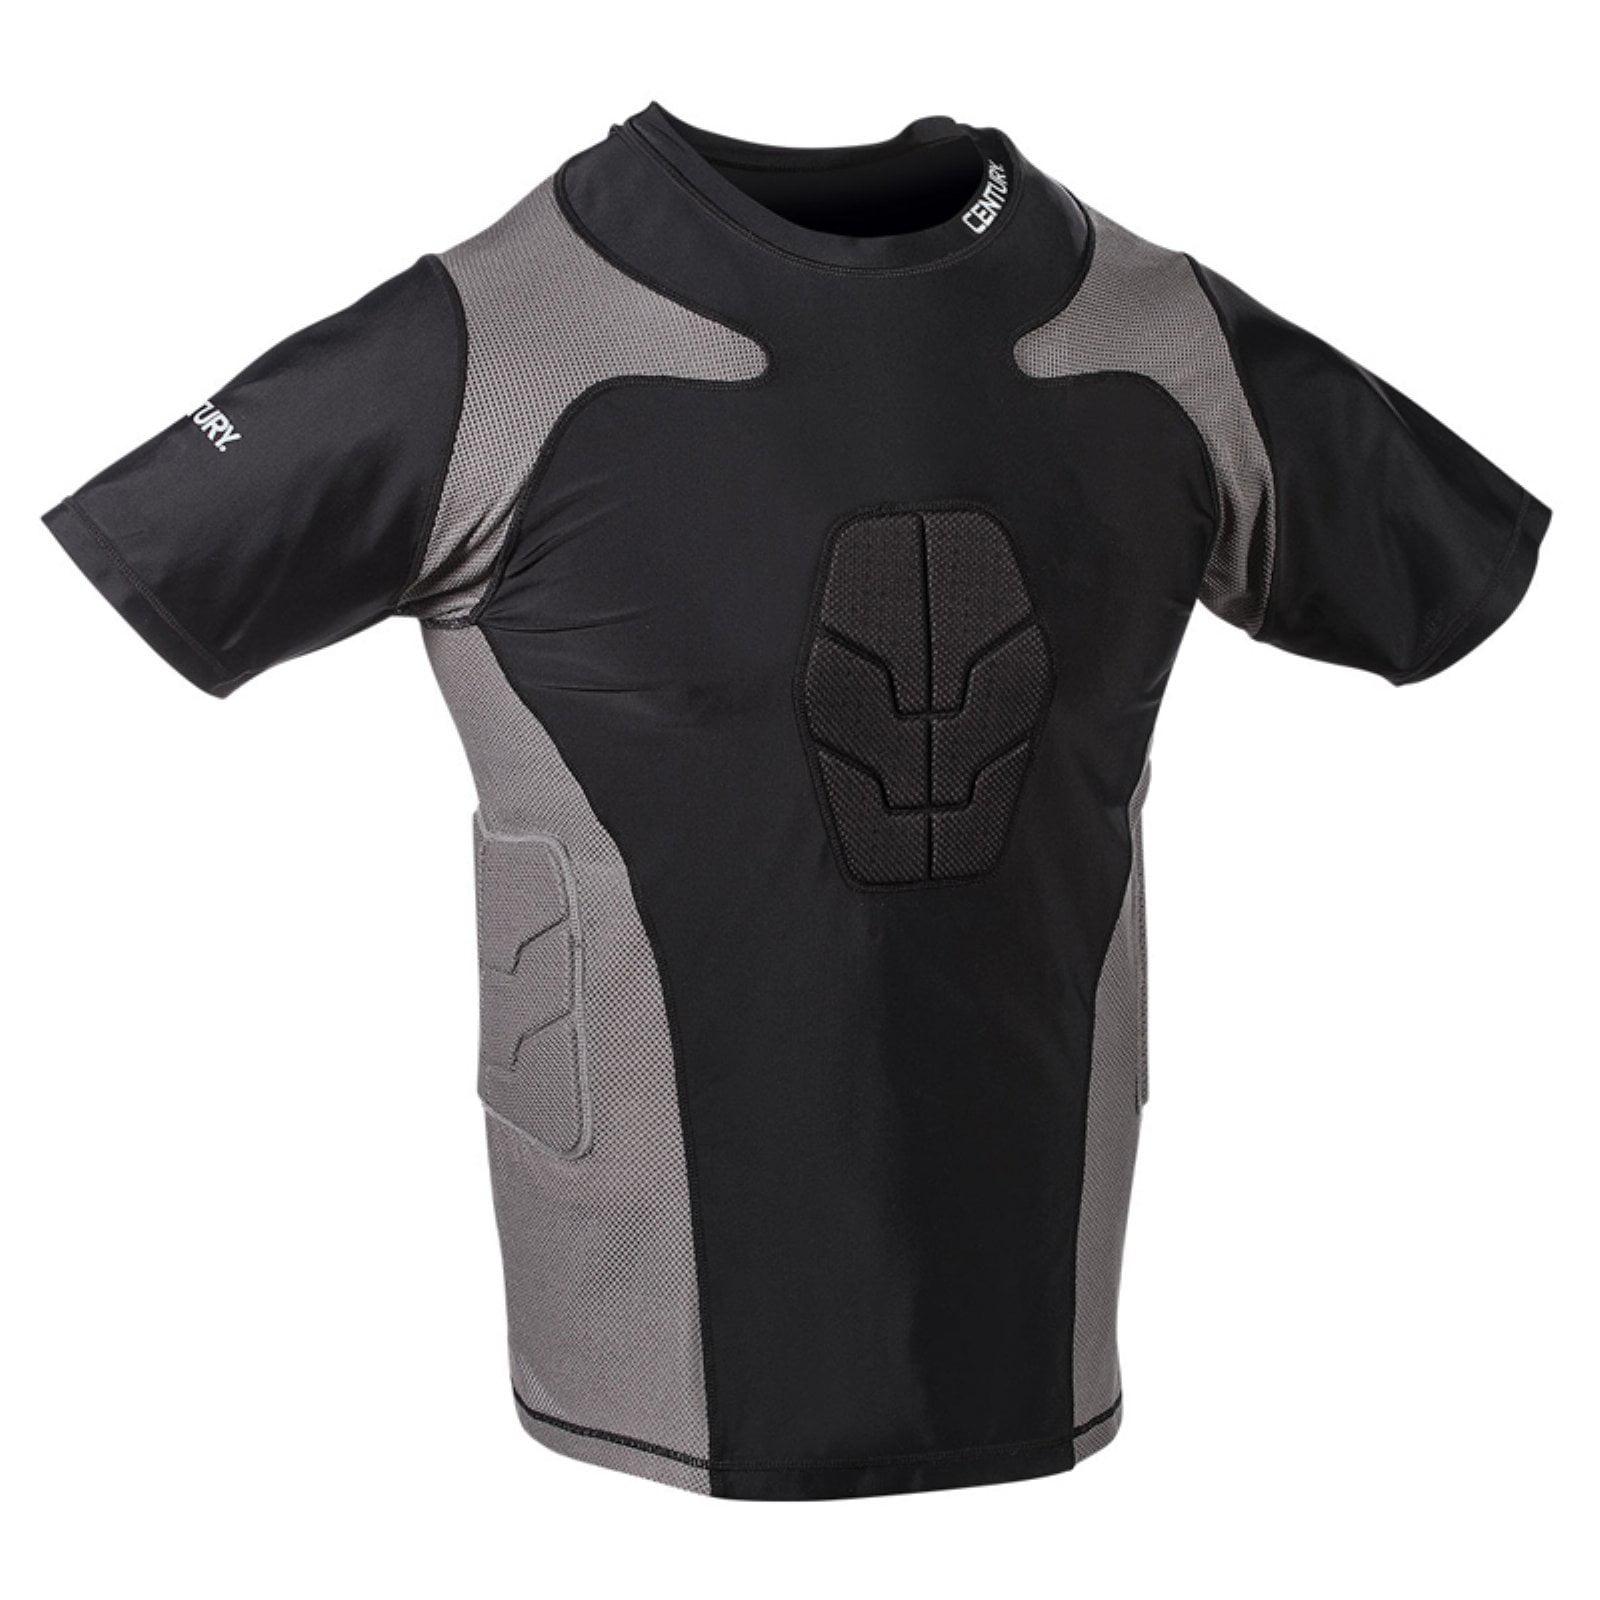 Century Short Sleeve Padded Youth Compression Shirt